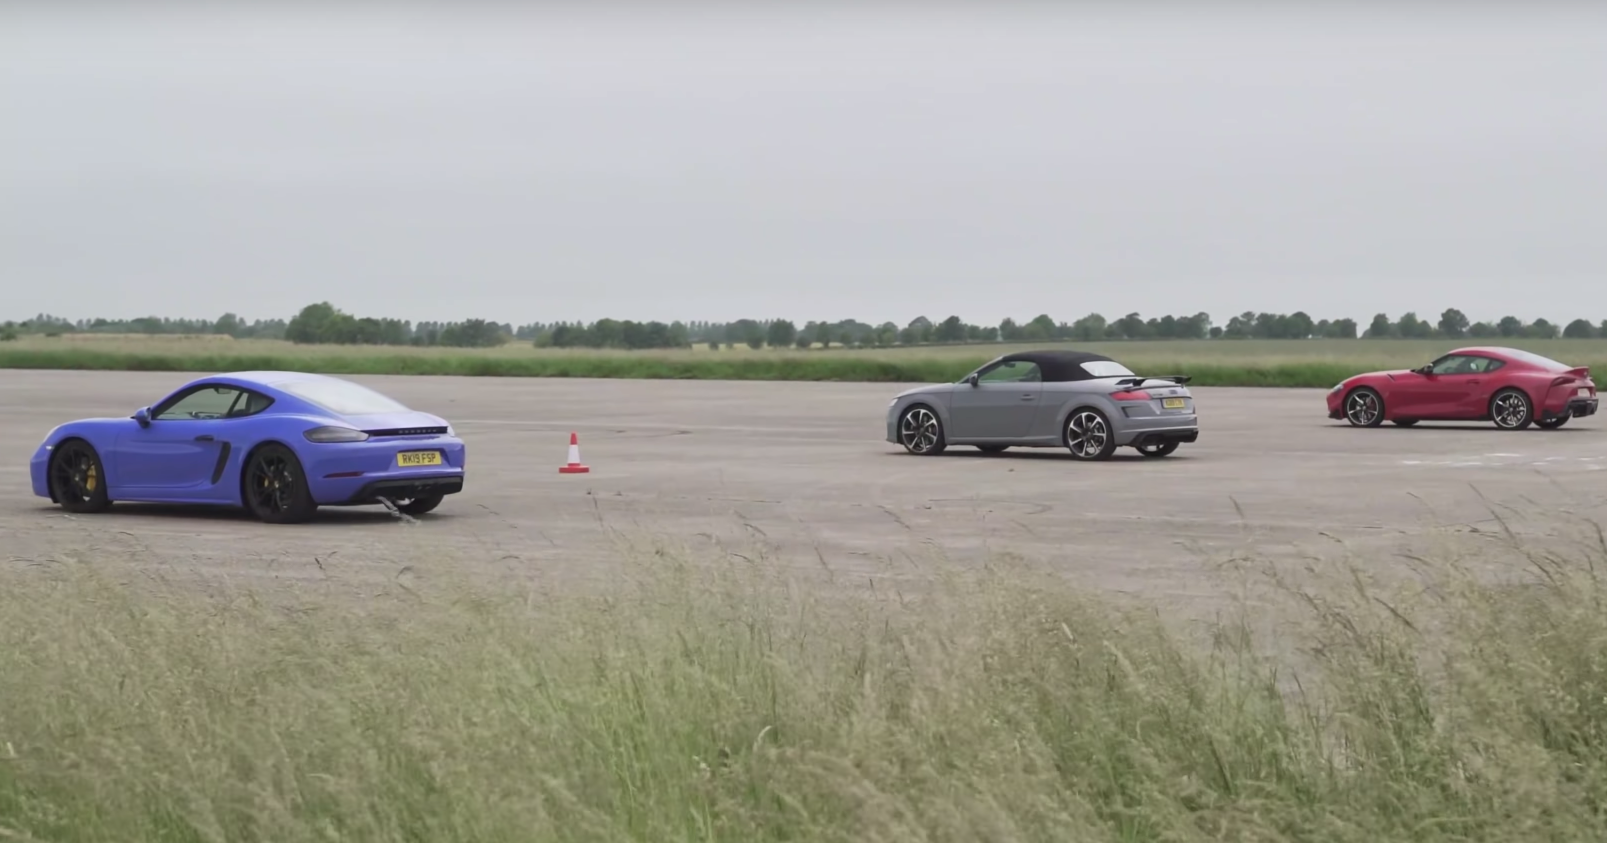 Toyota Supra, Porsche Cayman GTS, Audi TT RS, Alpine A110: дрэг-гонка